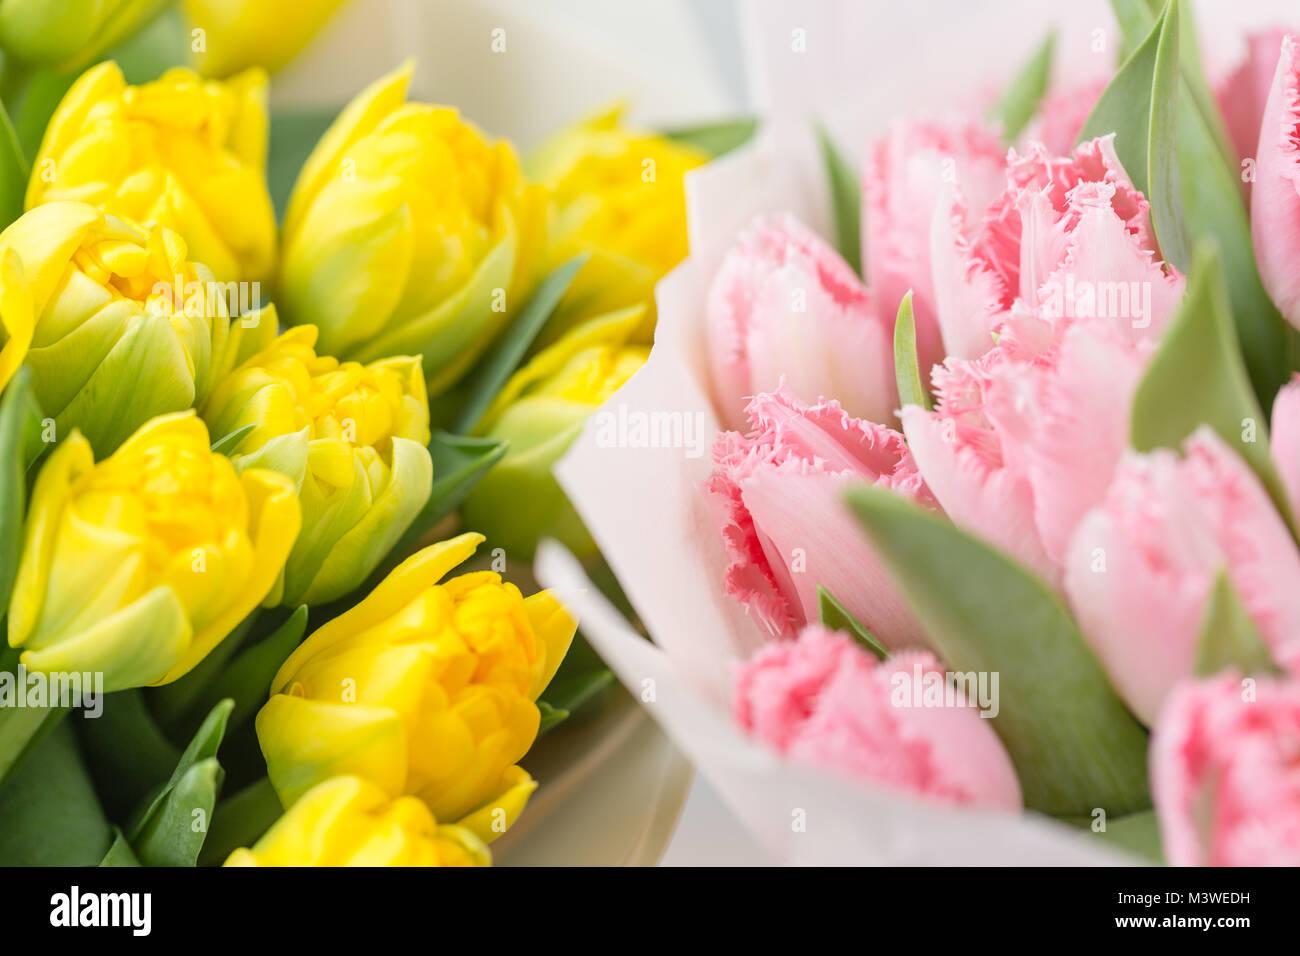 Tuips Closeup Flower Shop Concept Mixed Color Fresh Spring